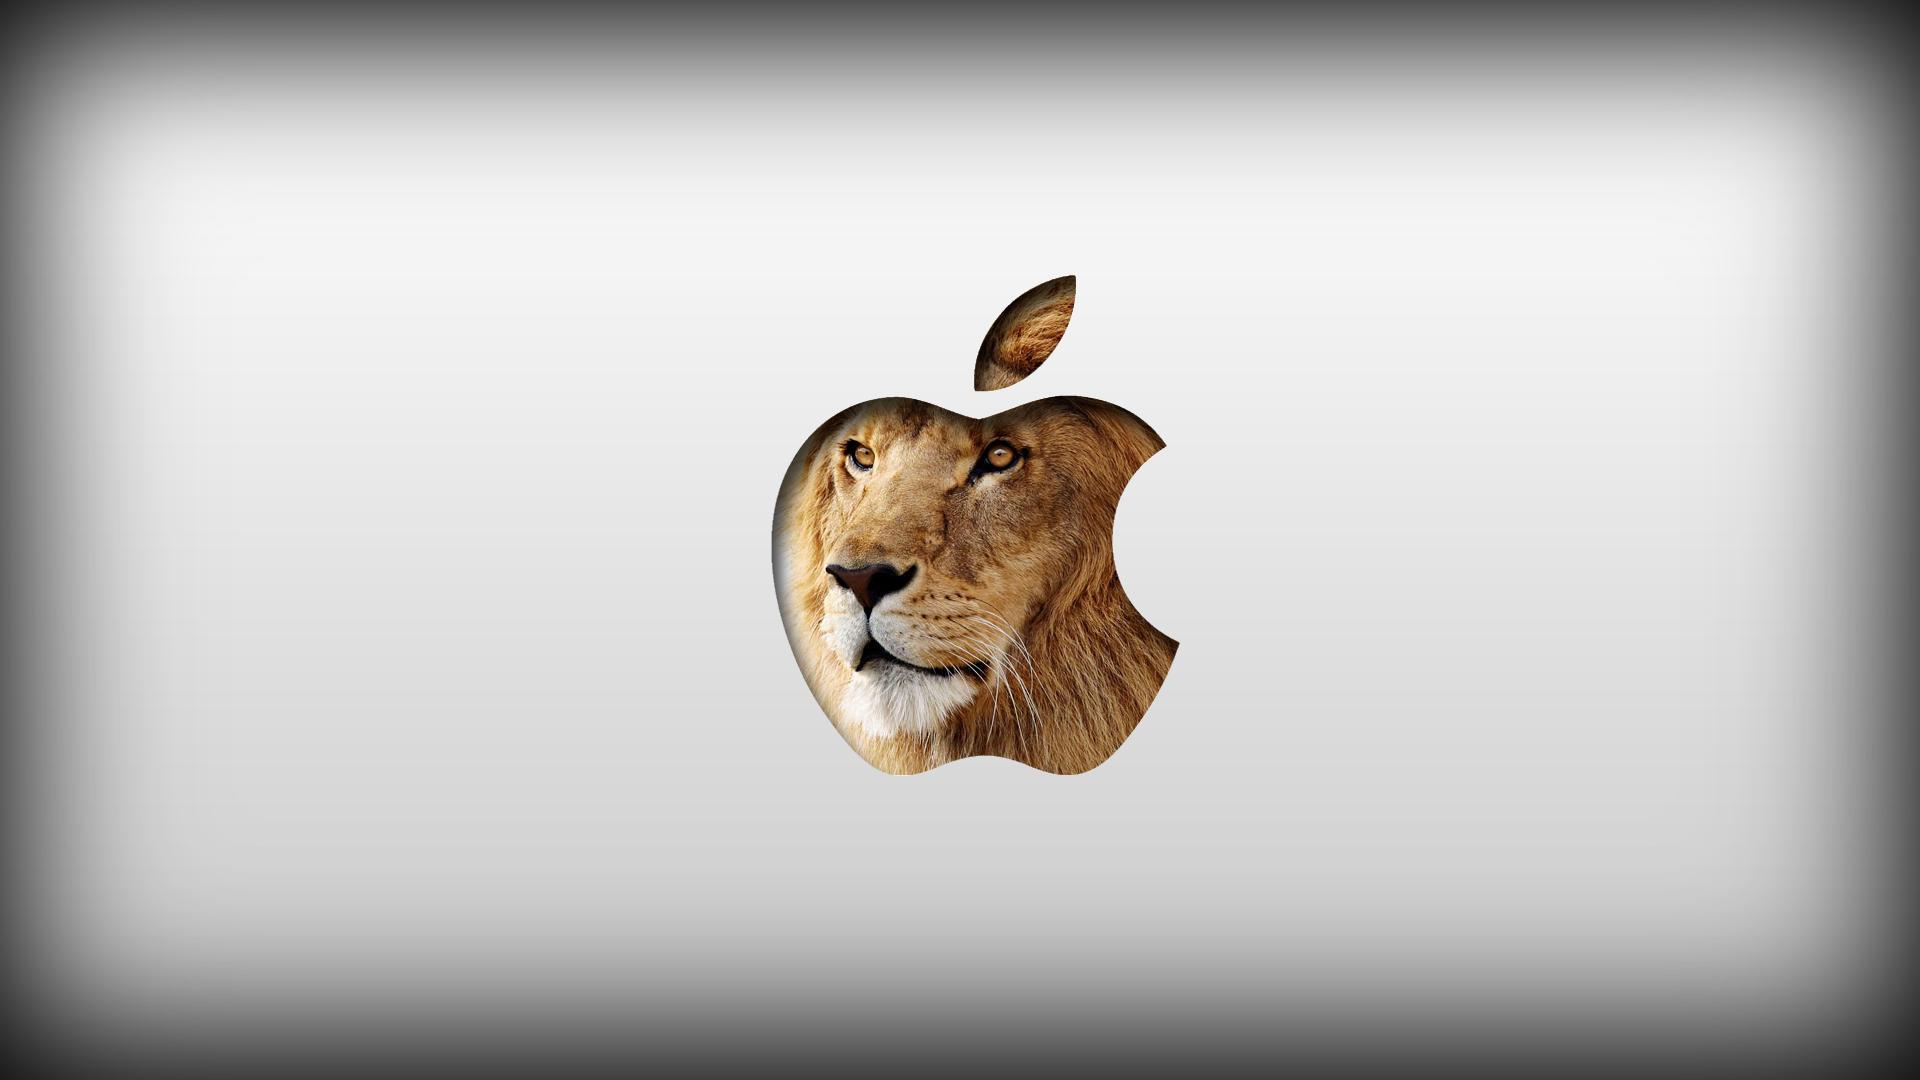 Wonderful Wallpaper Macbook Lion - mac_os_x_lion_wide_wallpaper_by_killingtheengine-d31c6si  2018_45618.jpg